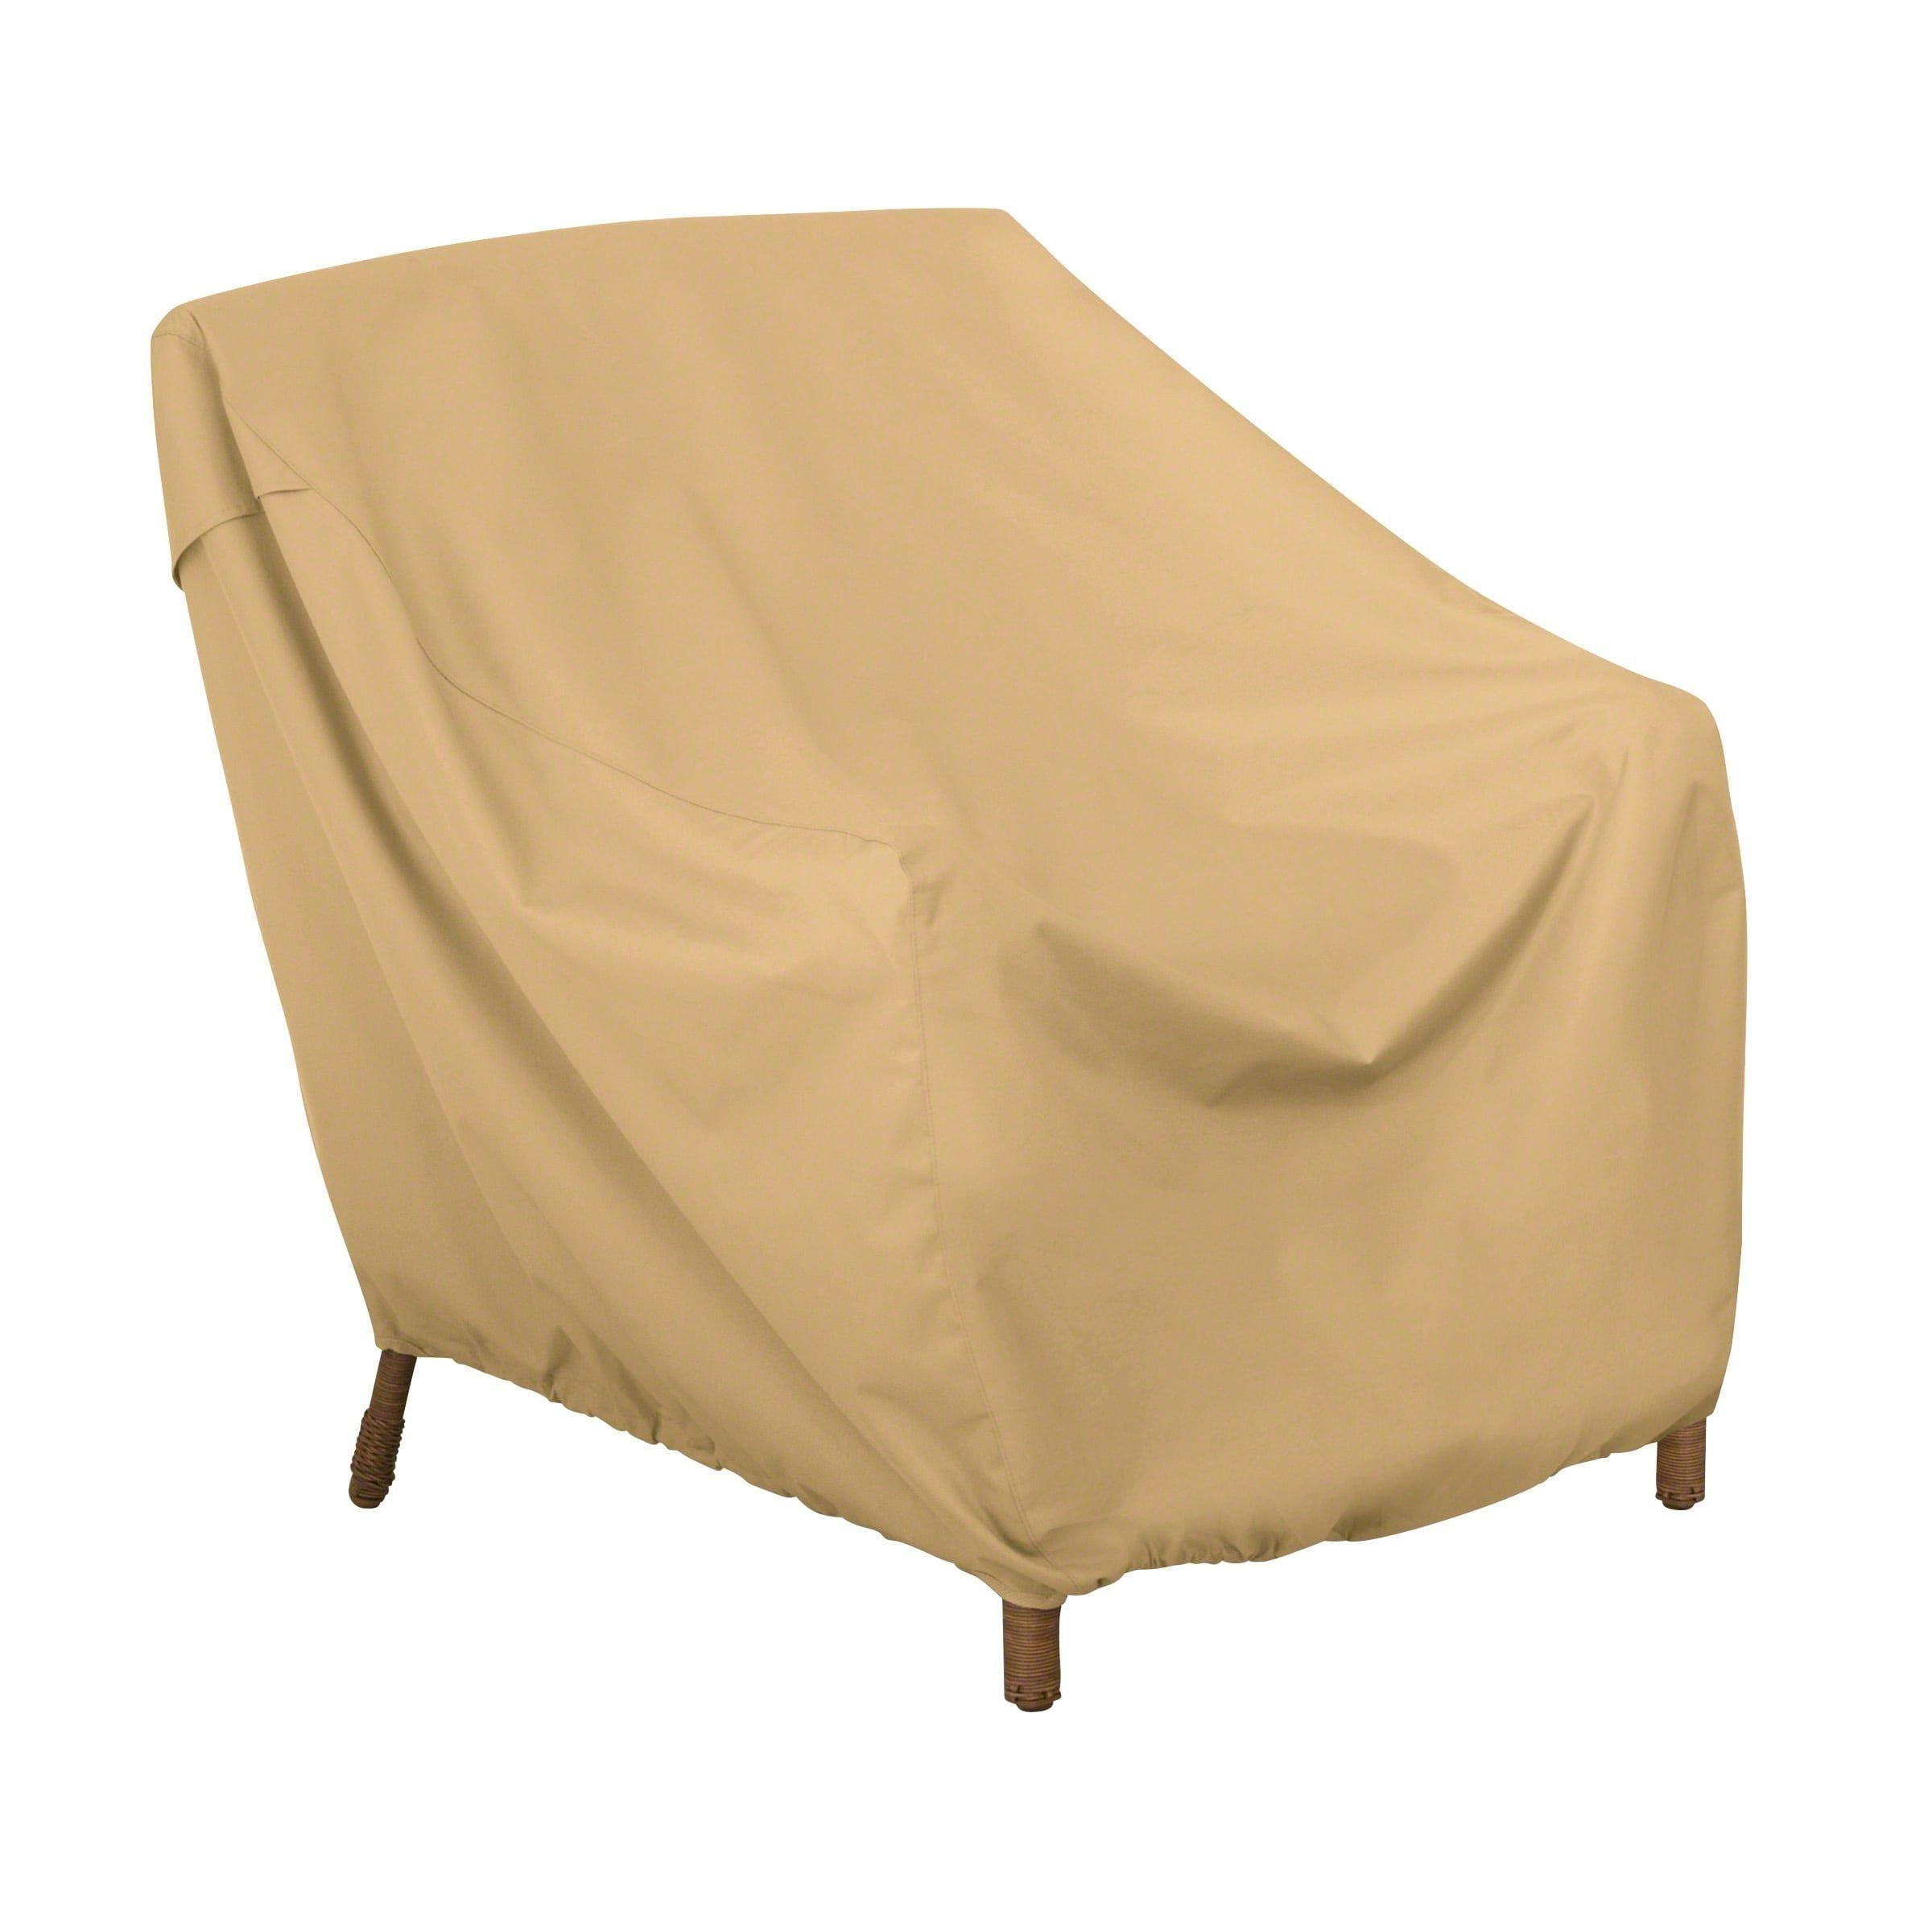 Classic Accessories Terrazzo Patio Lounge Chair Cover All